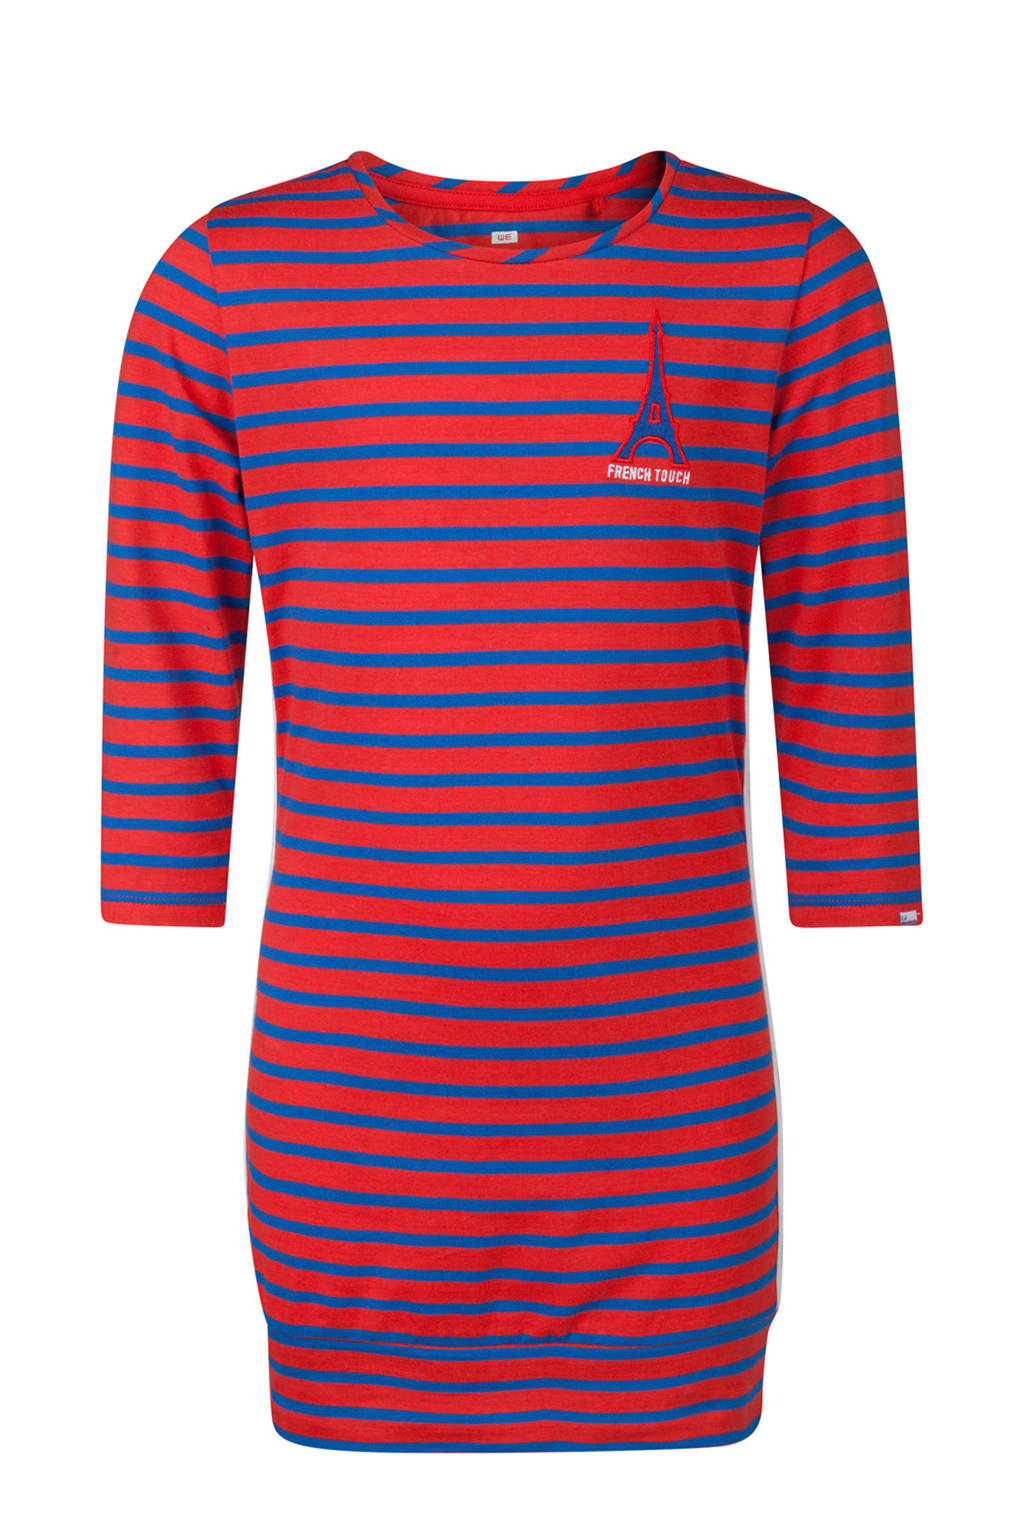 WE Fashion lang gestreept T-shirt rood, Rood/blauw